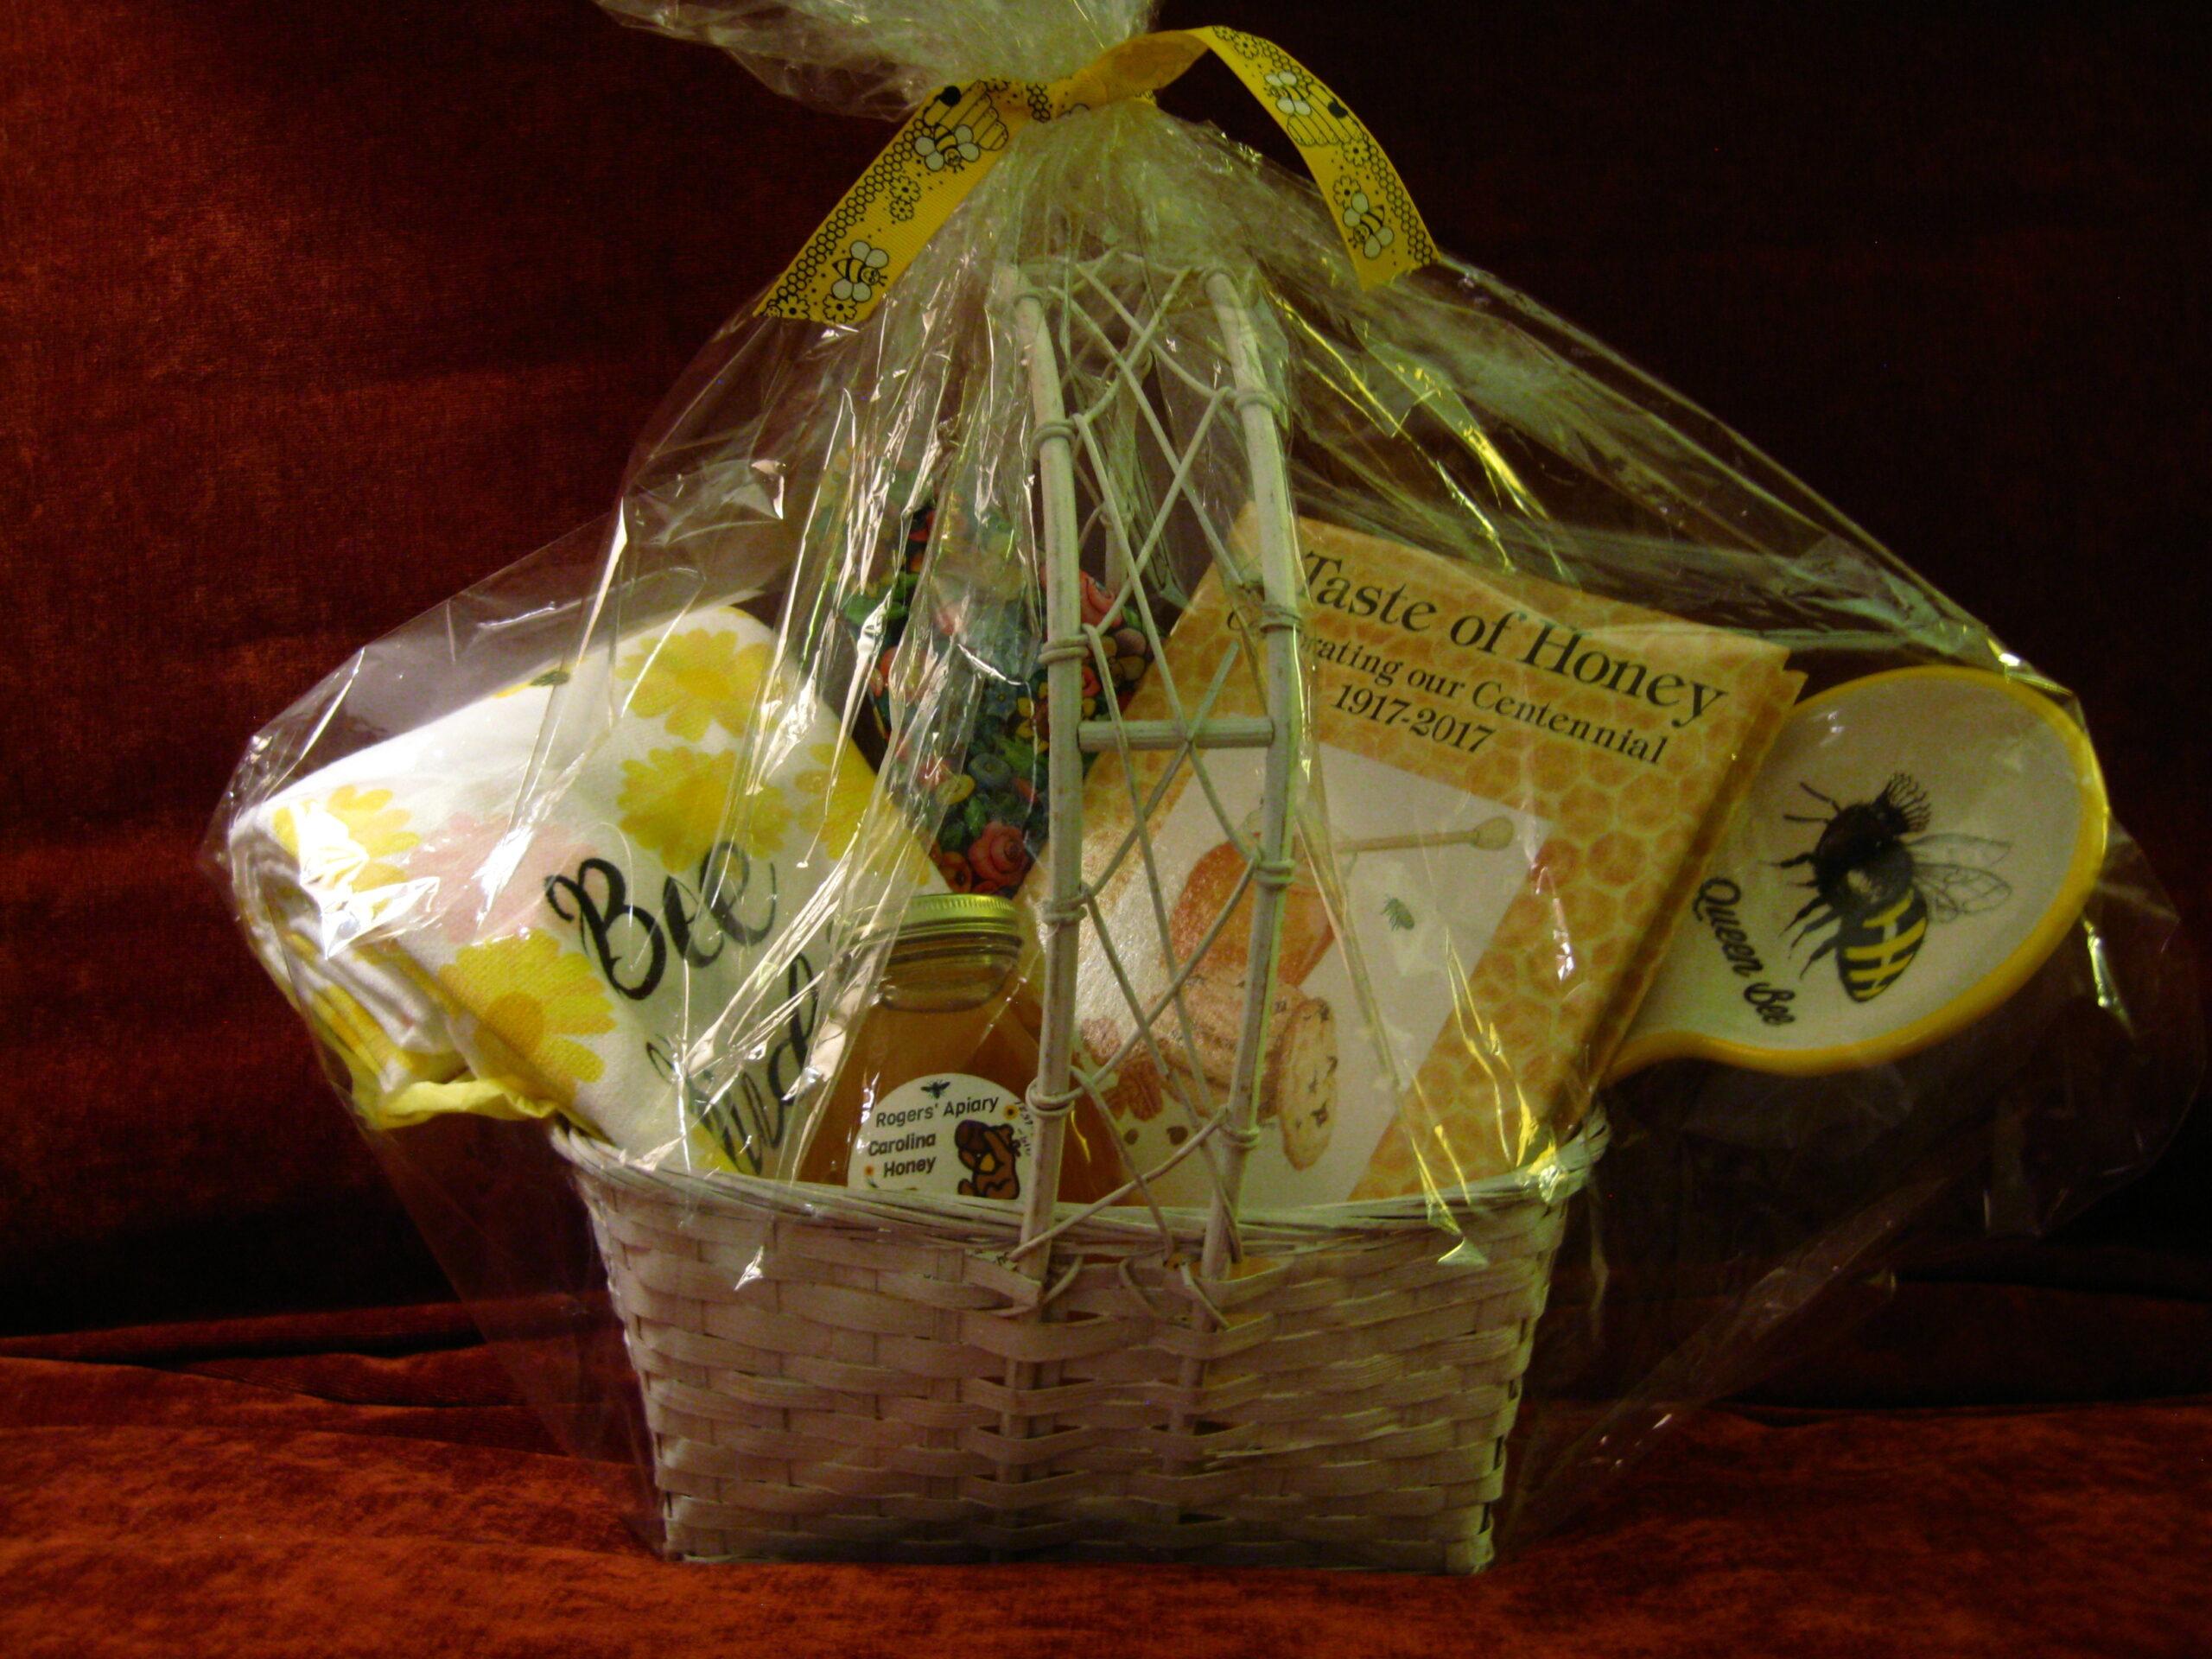 Kitchen Gift Basket with Roger's Apiary Carolina Honey